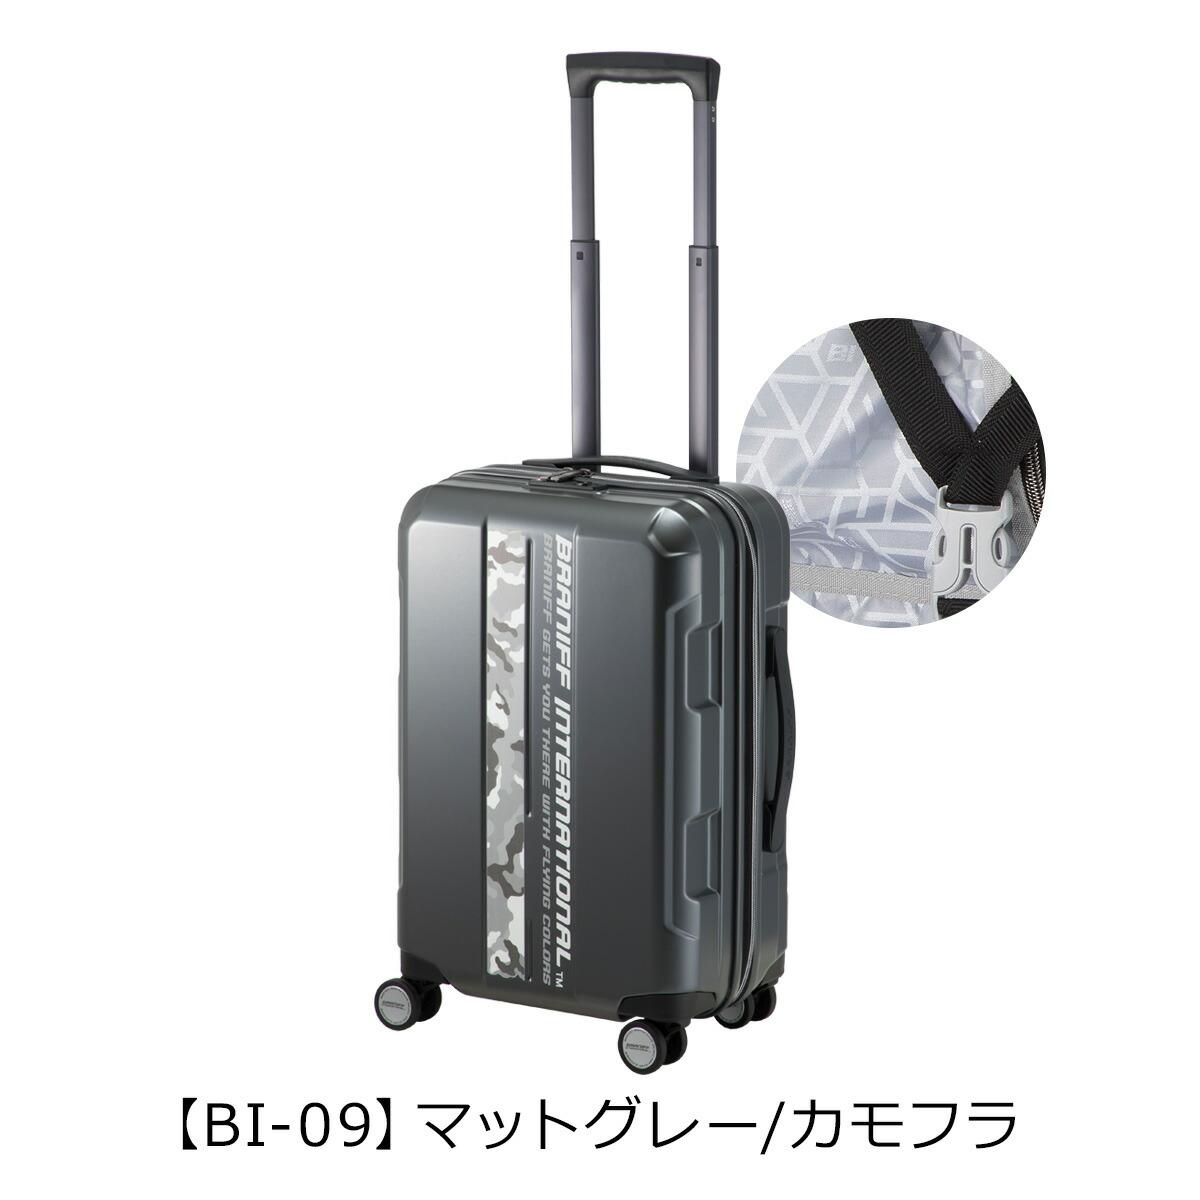 【BI-09】マットグレー/カモフラ